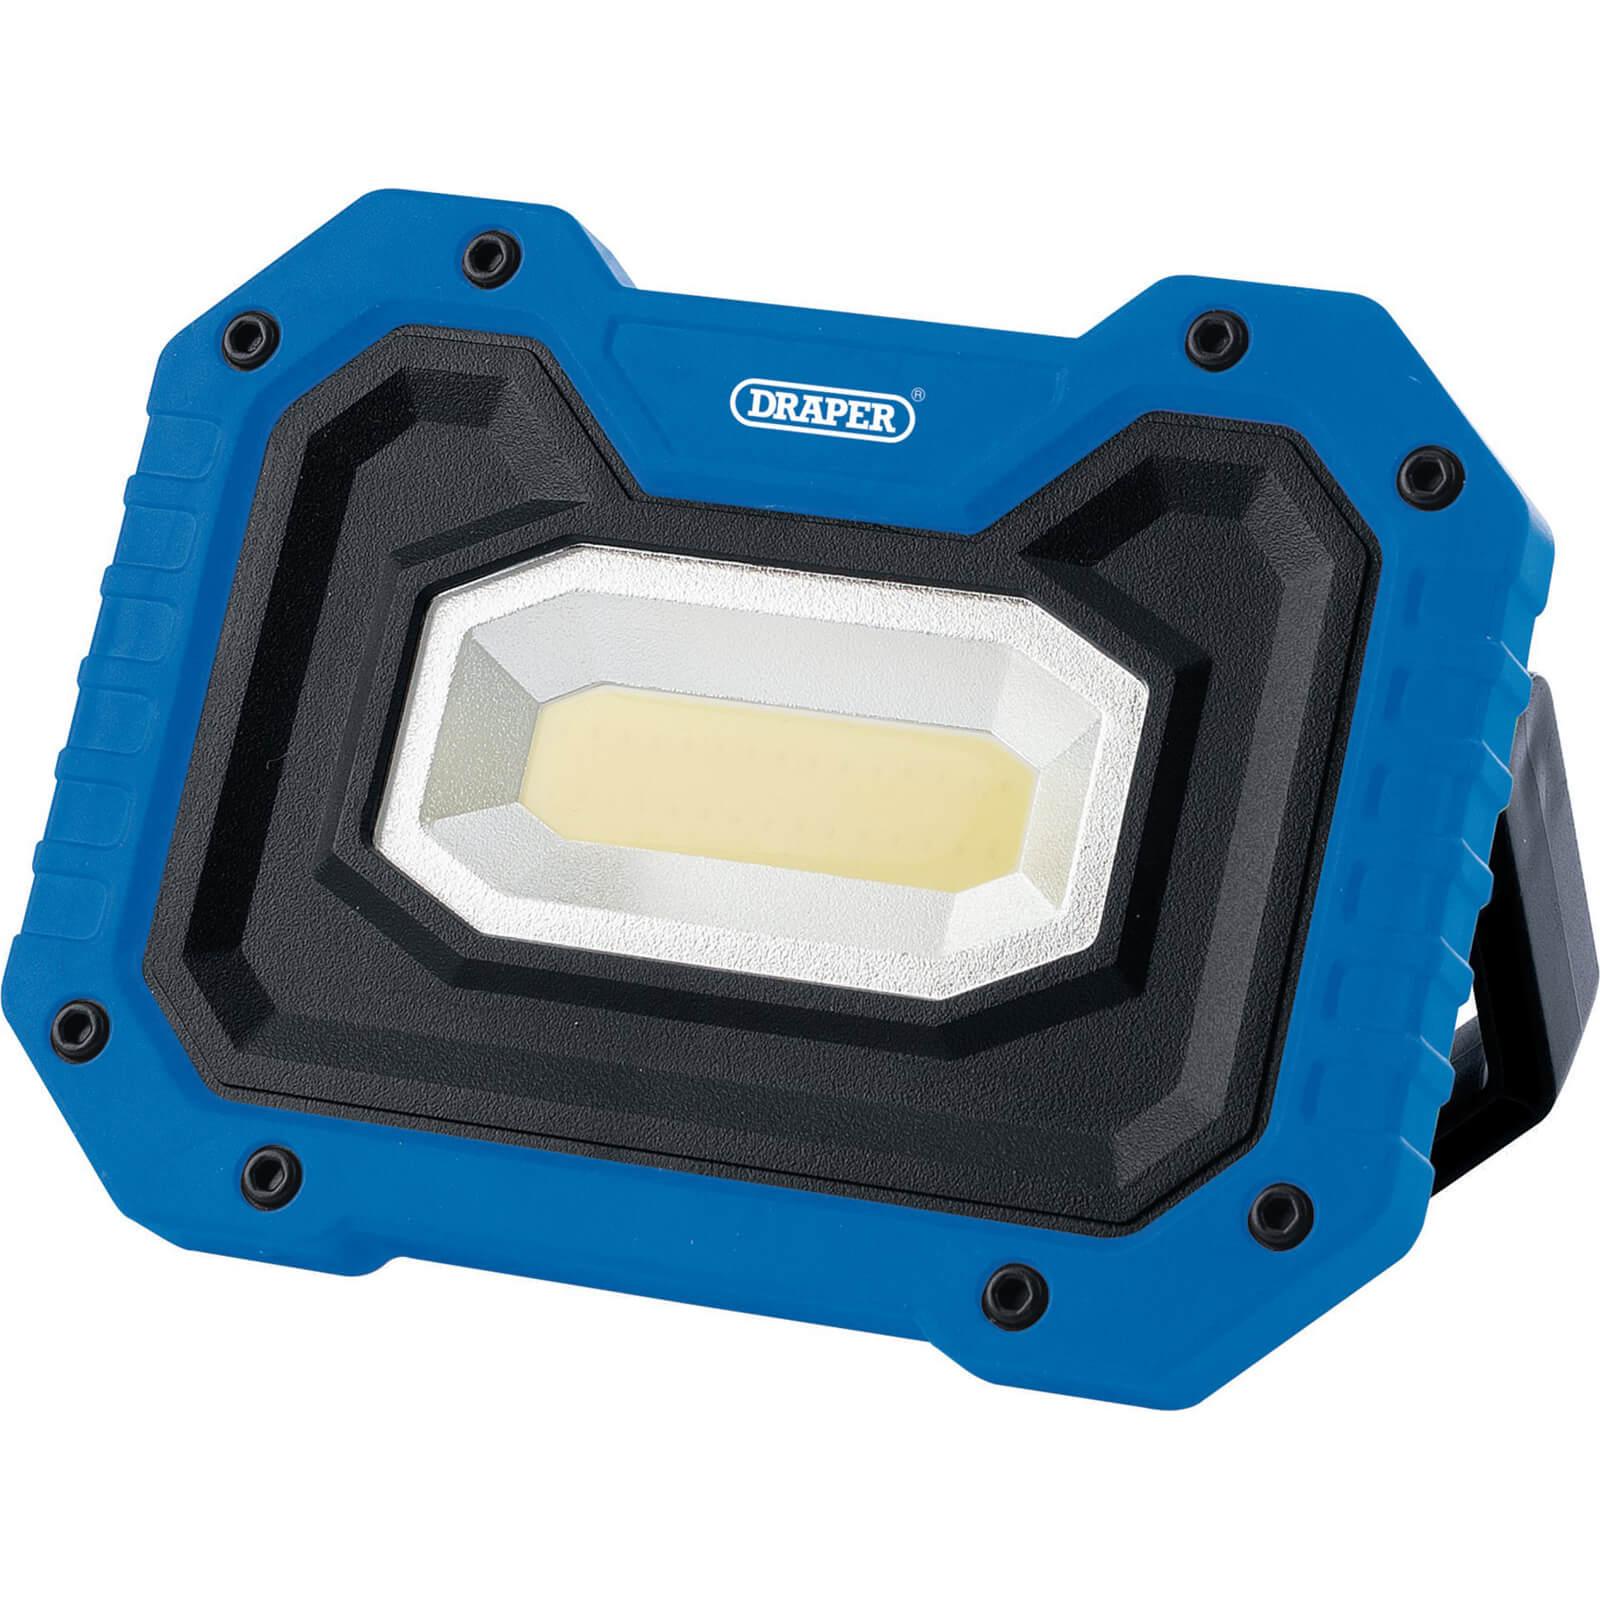 Draper Rechargeable Work Light Power Bank and Wireless Speaker Blue